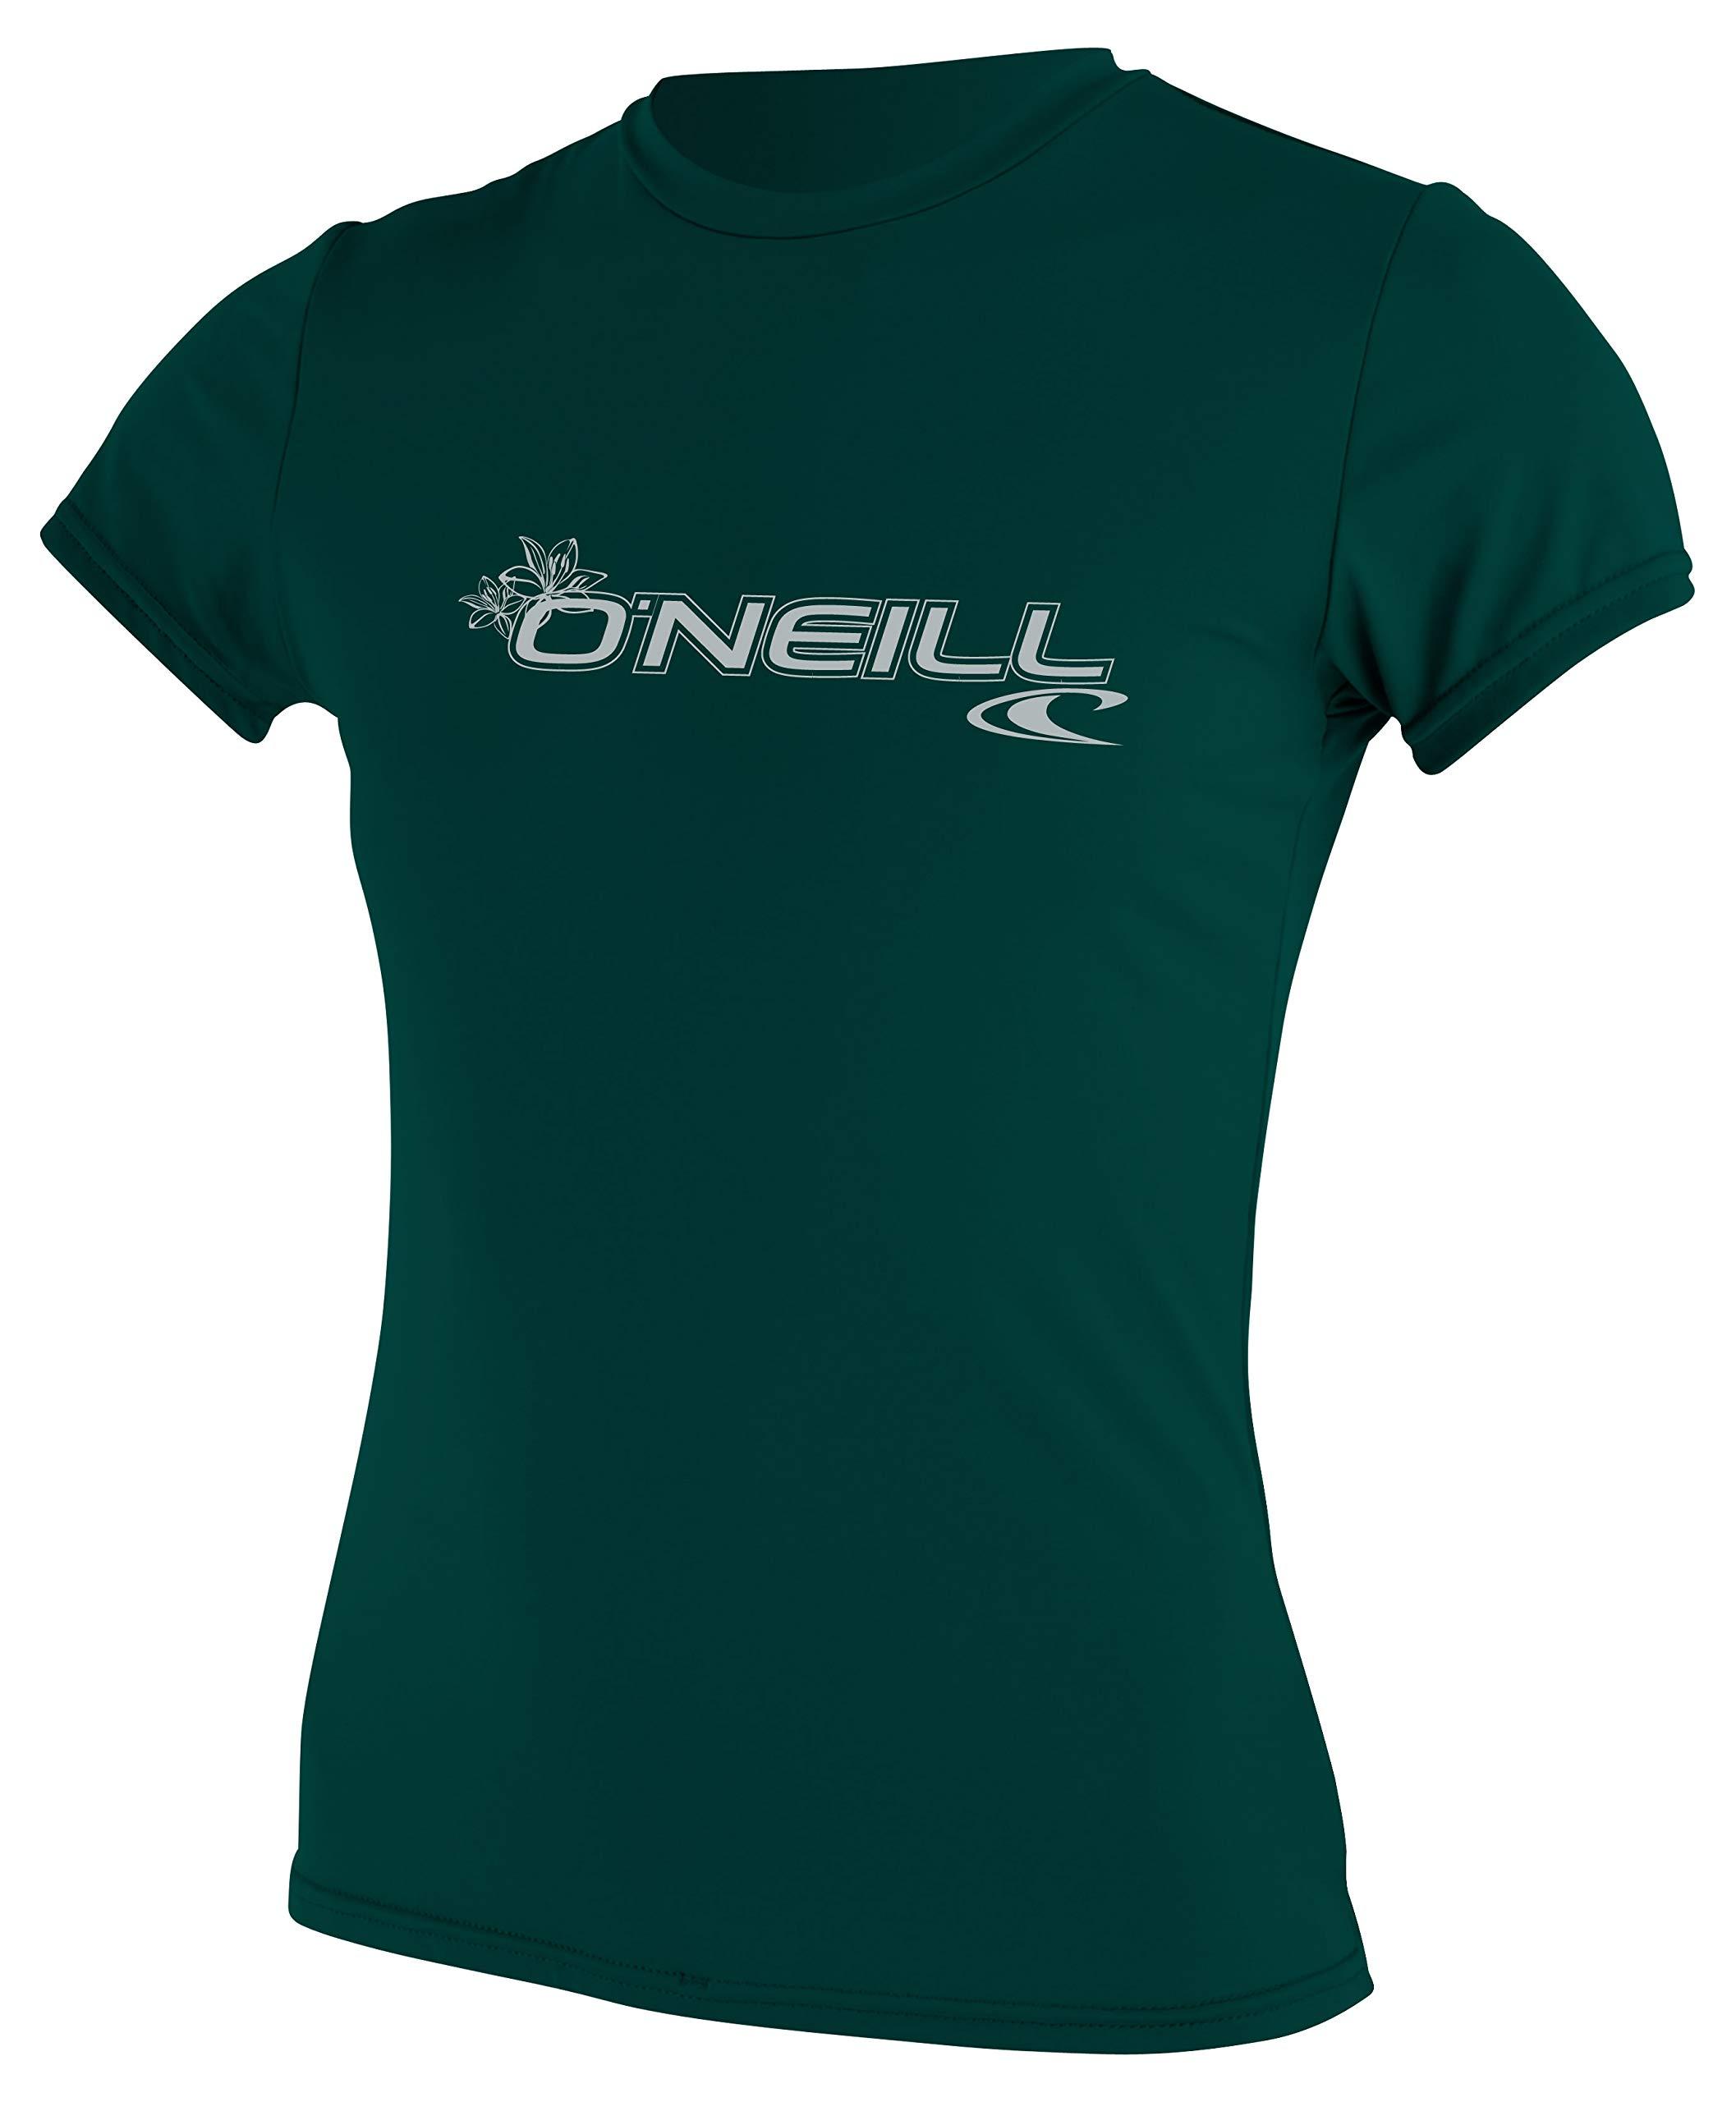 O'Neill Women Basic Upf50+ S/S Tops, Deep Green, S by O'Neill Wetsuits